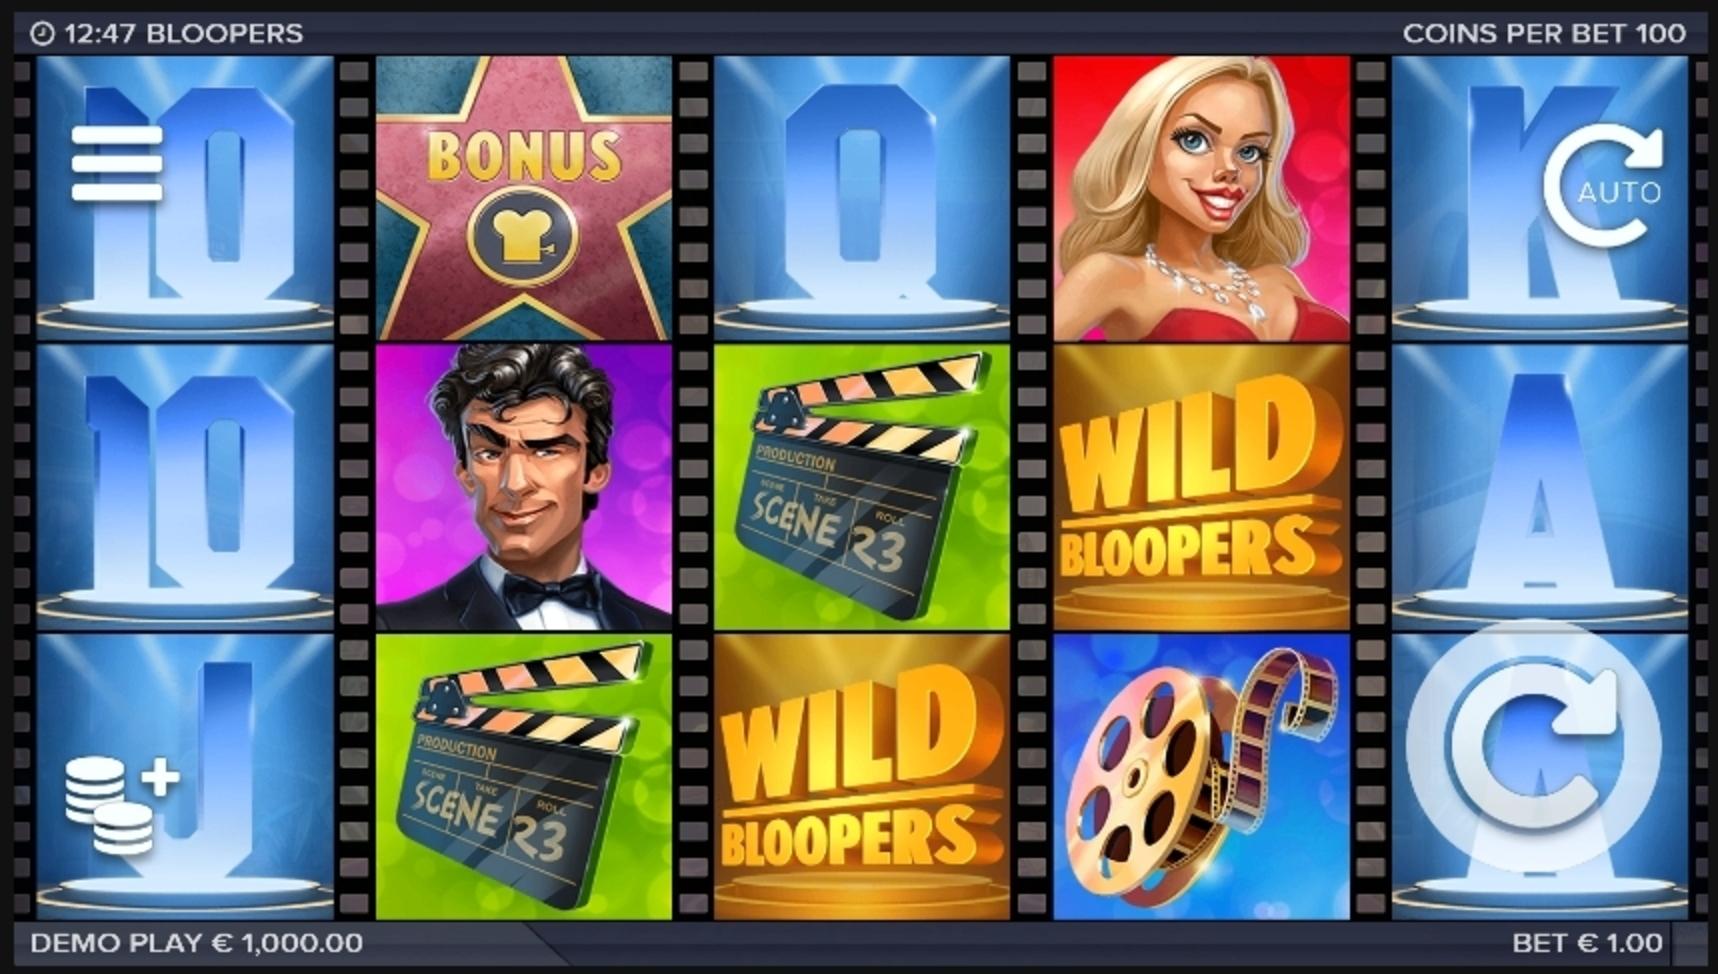 Bloopers Slot Machine Demo